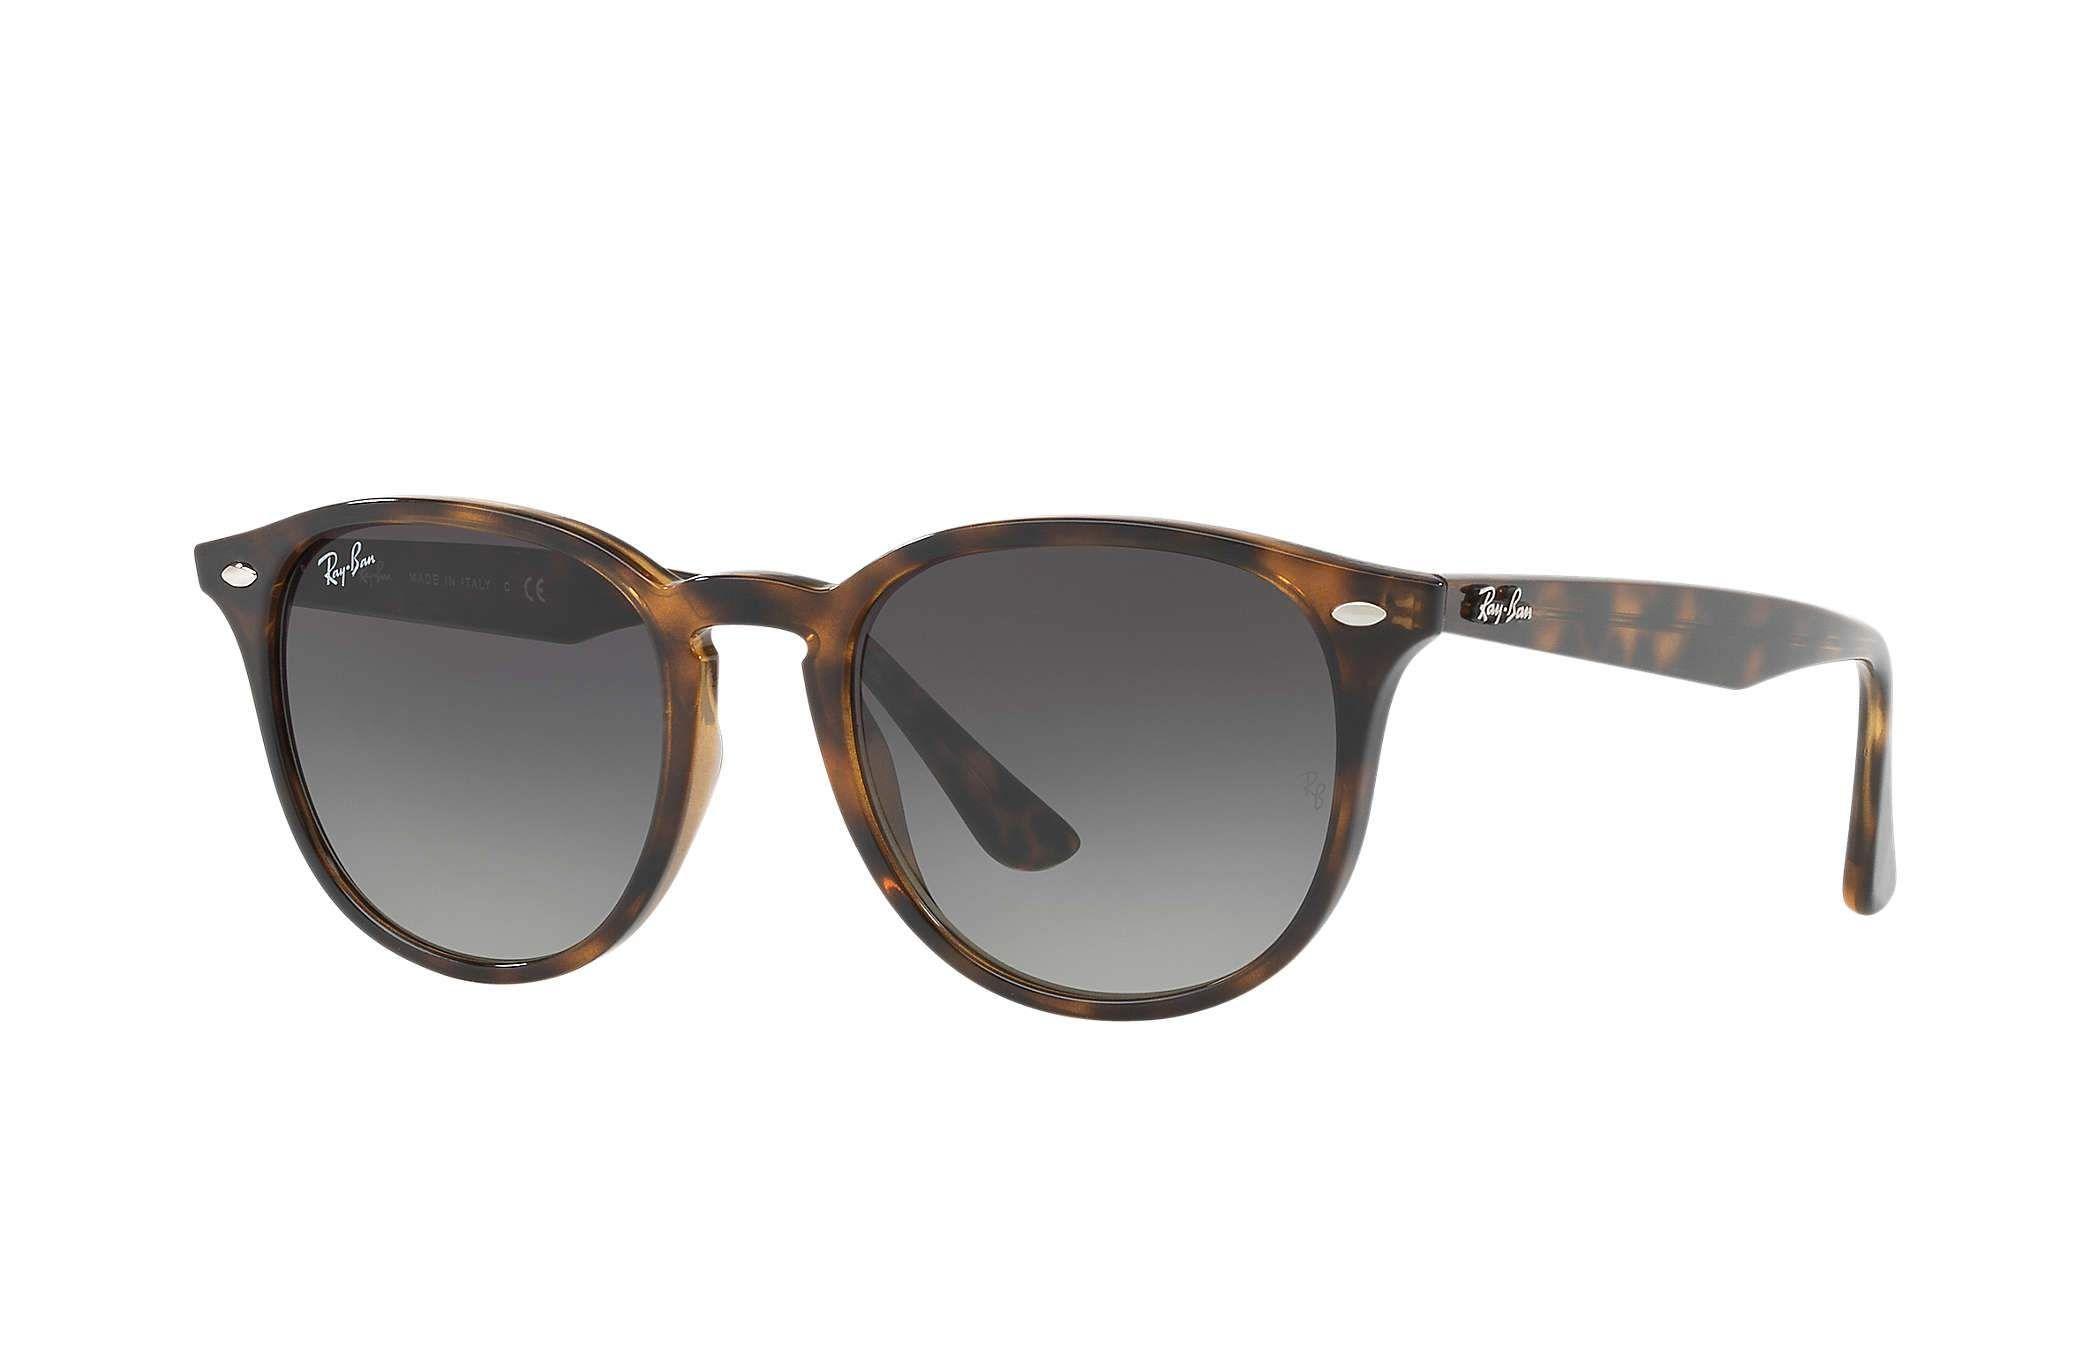 fcabbec680363 Ray-Ban RB4259 710 1151 Sunglasses